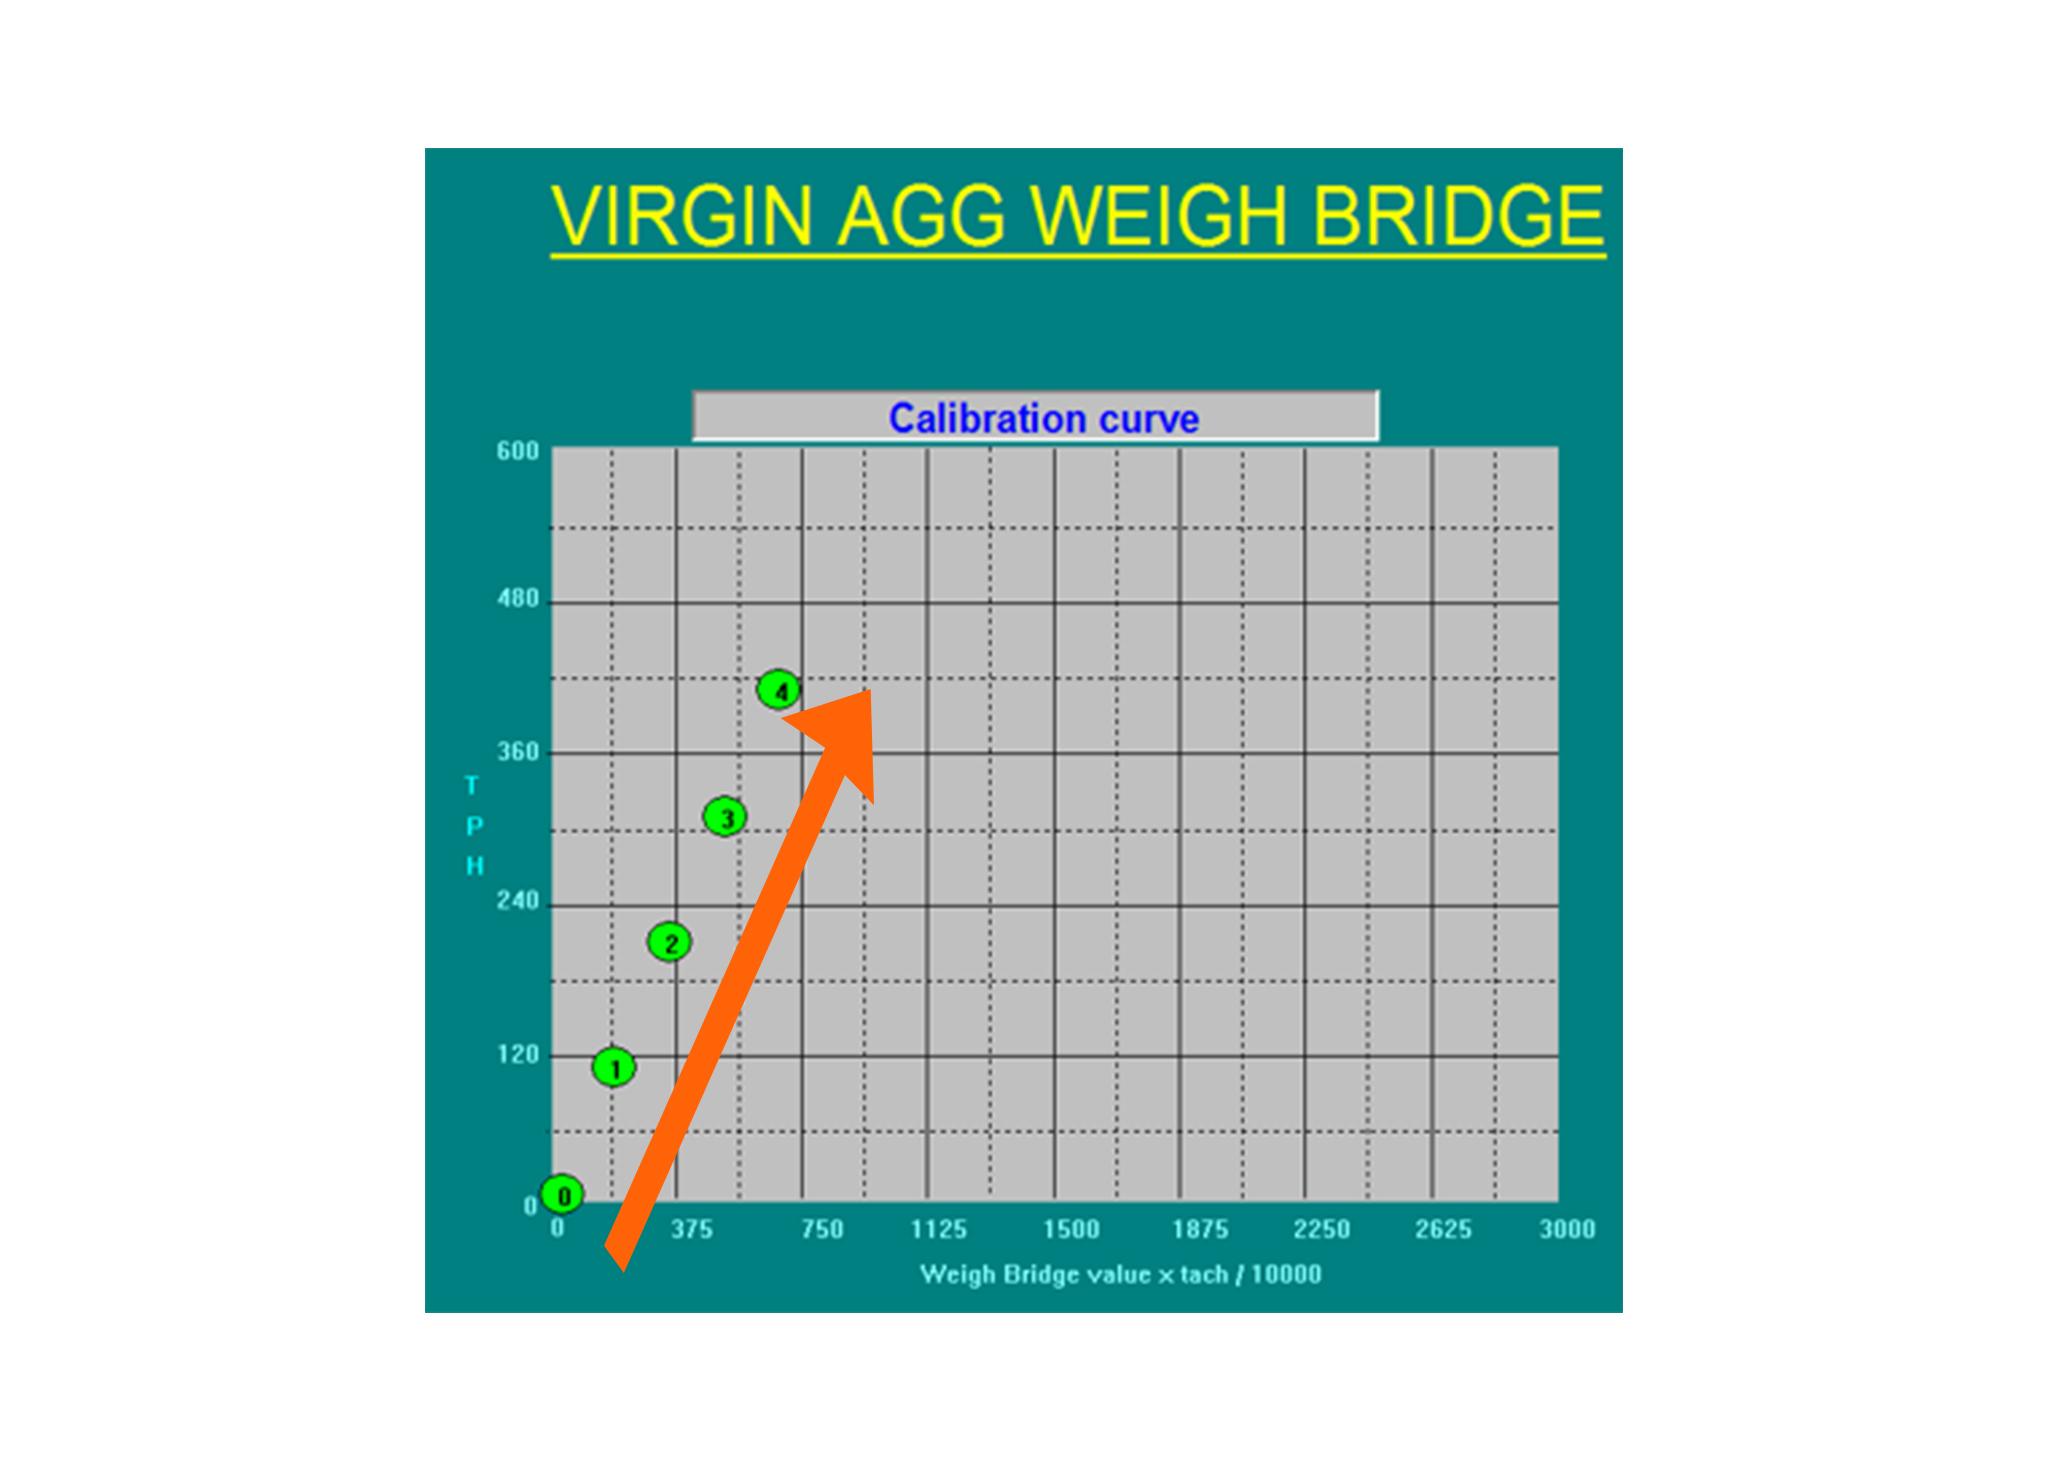 Weighbridge-Calibration-Curve-Straight-Line_WEM-Automation